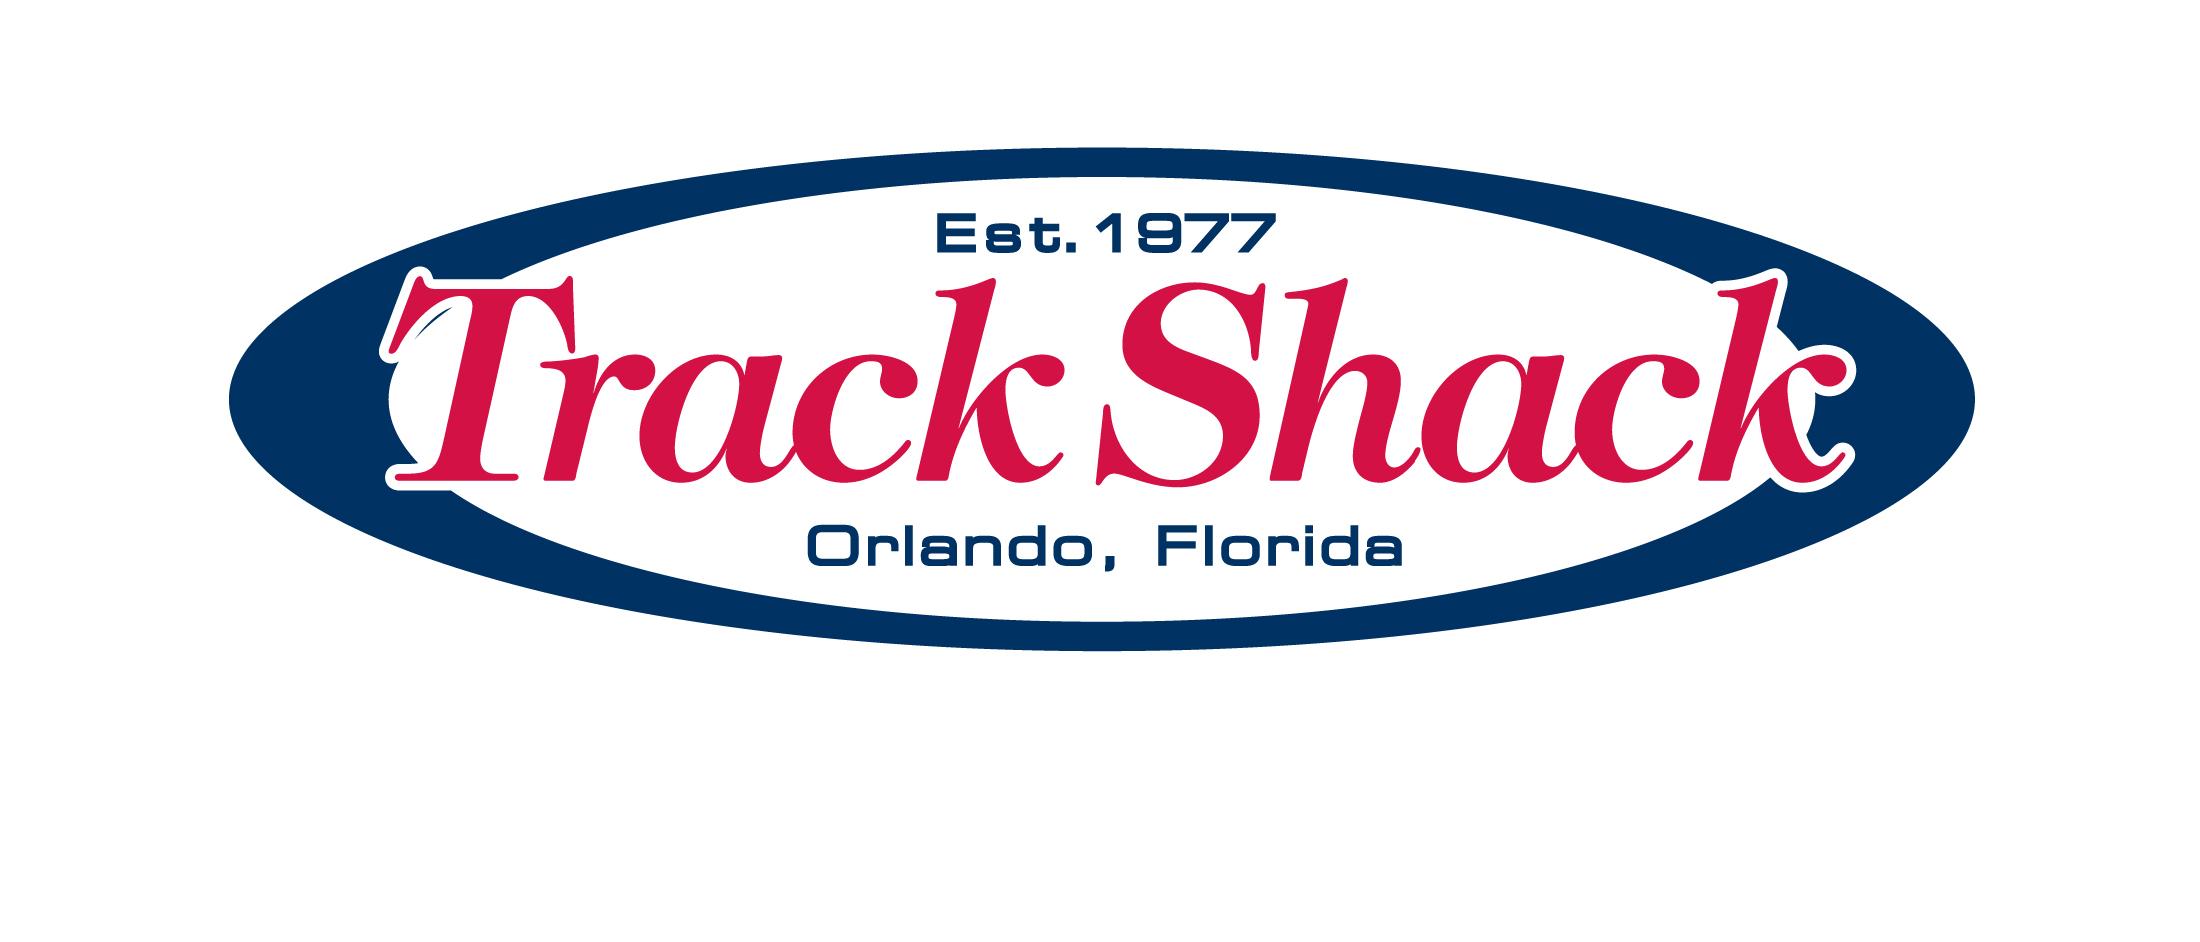 Track Shack